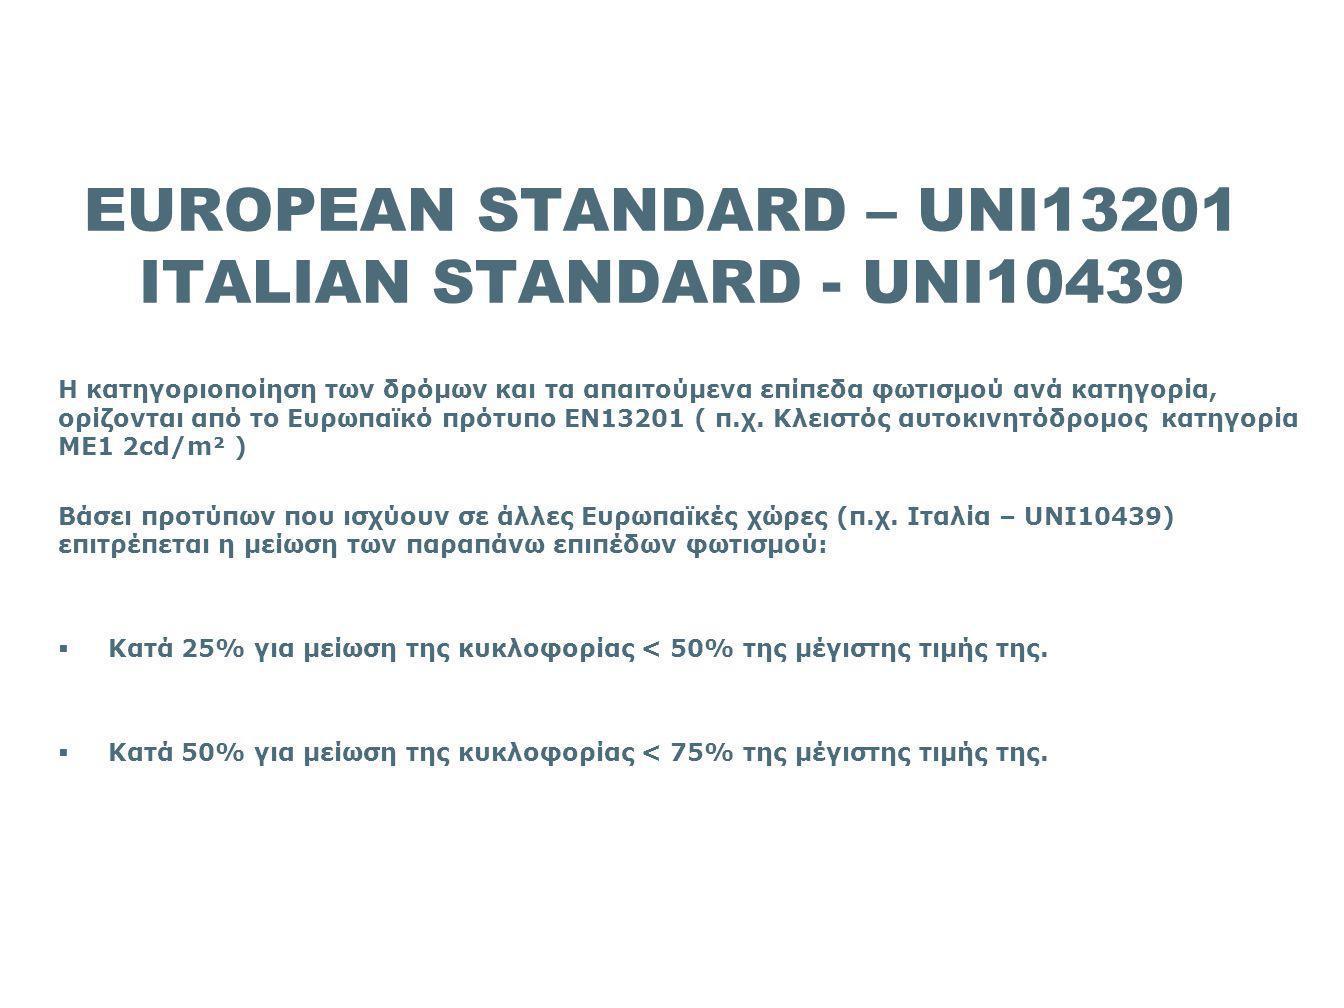 EUROPEAN STANDARD – UNI13201 ITALIAN STANDARD - UNI10439